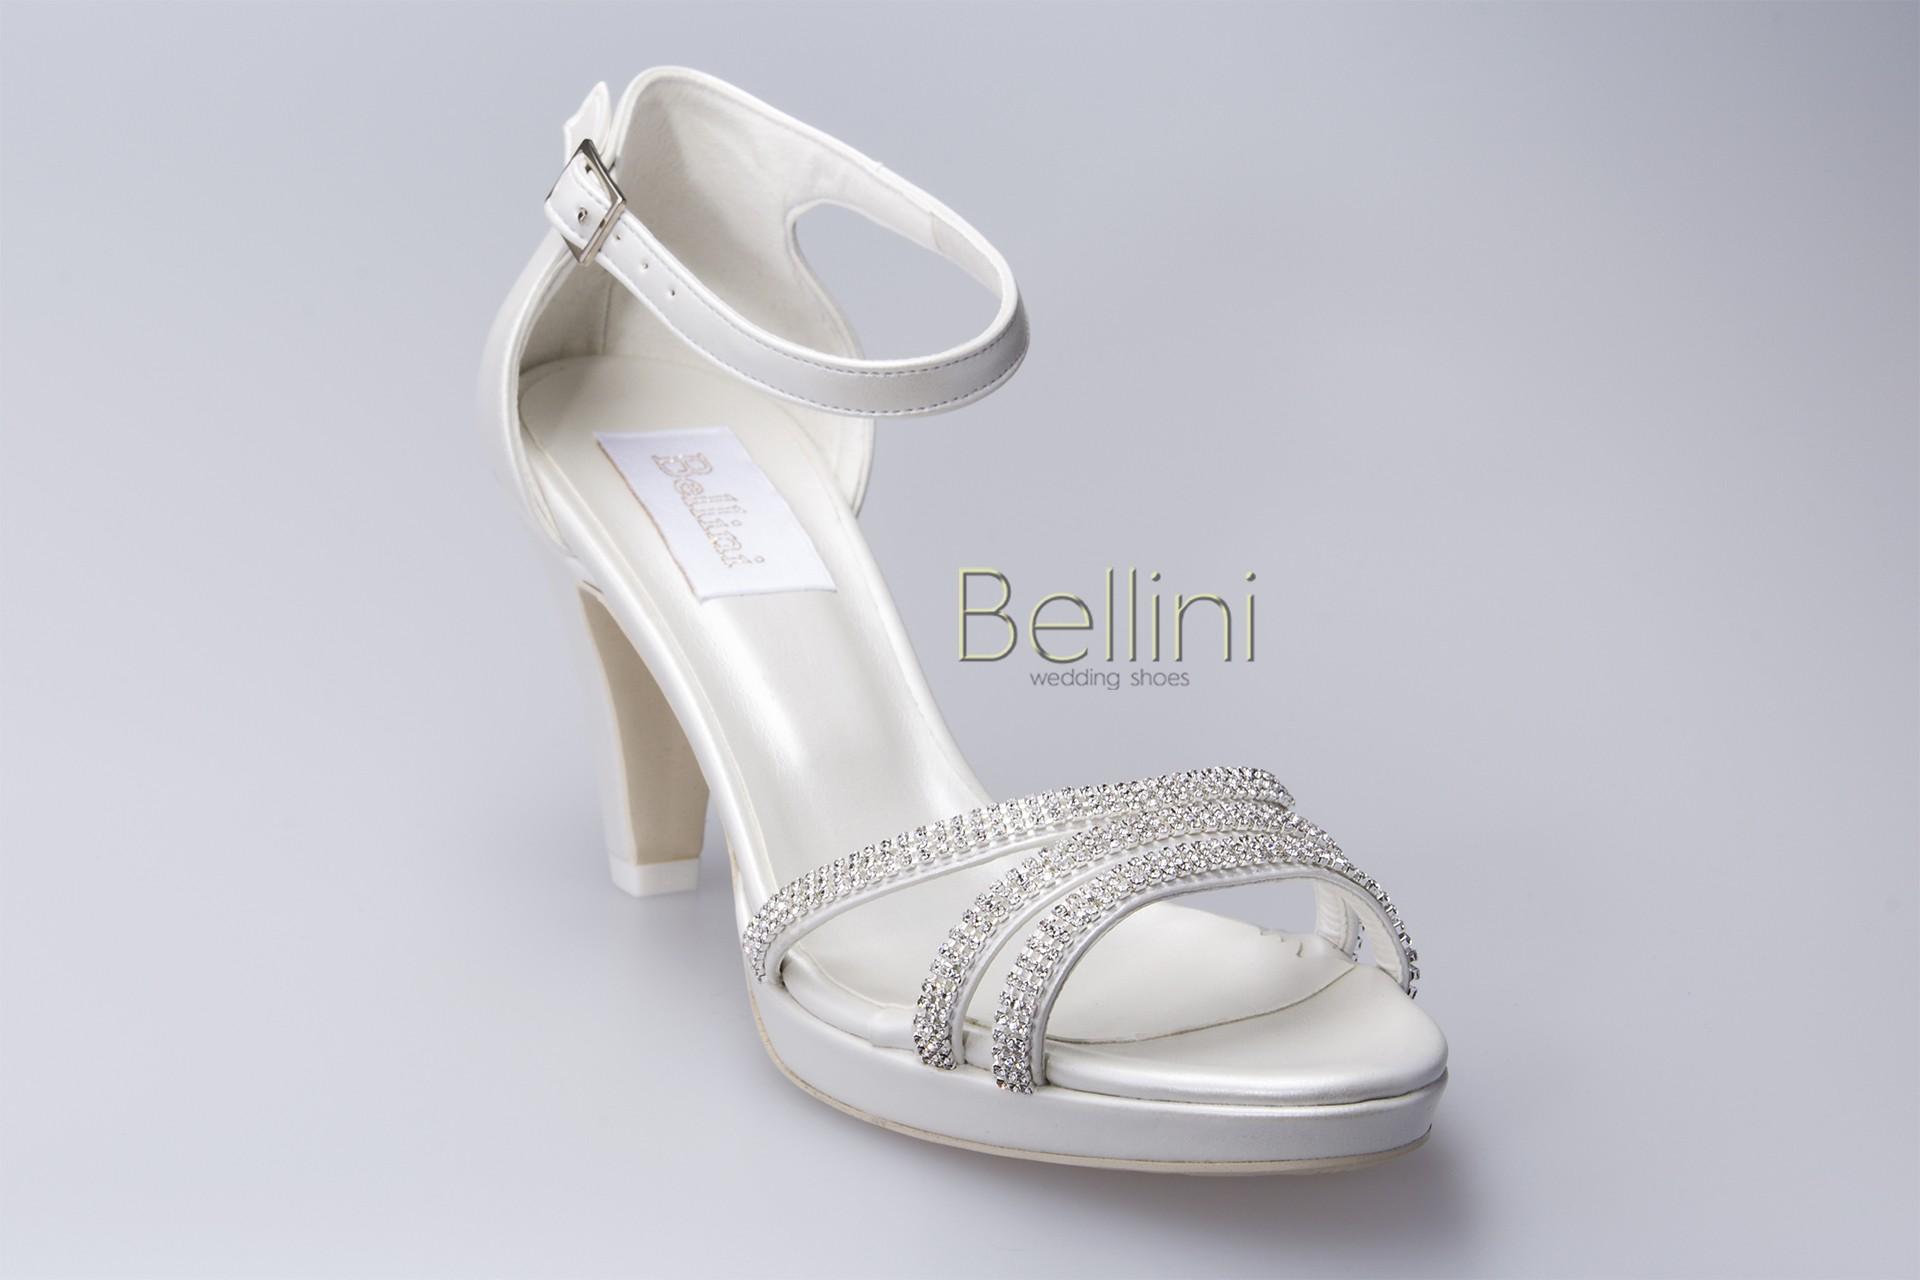 Bellini Wedding Shoes